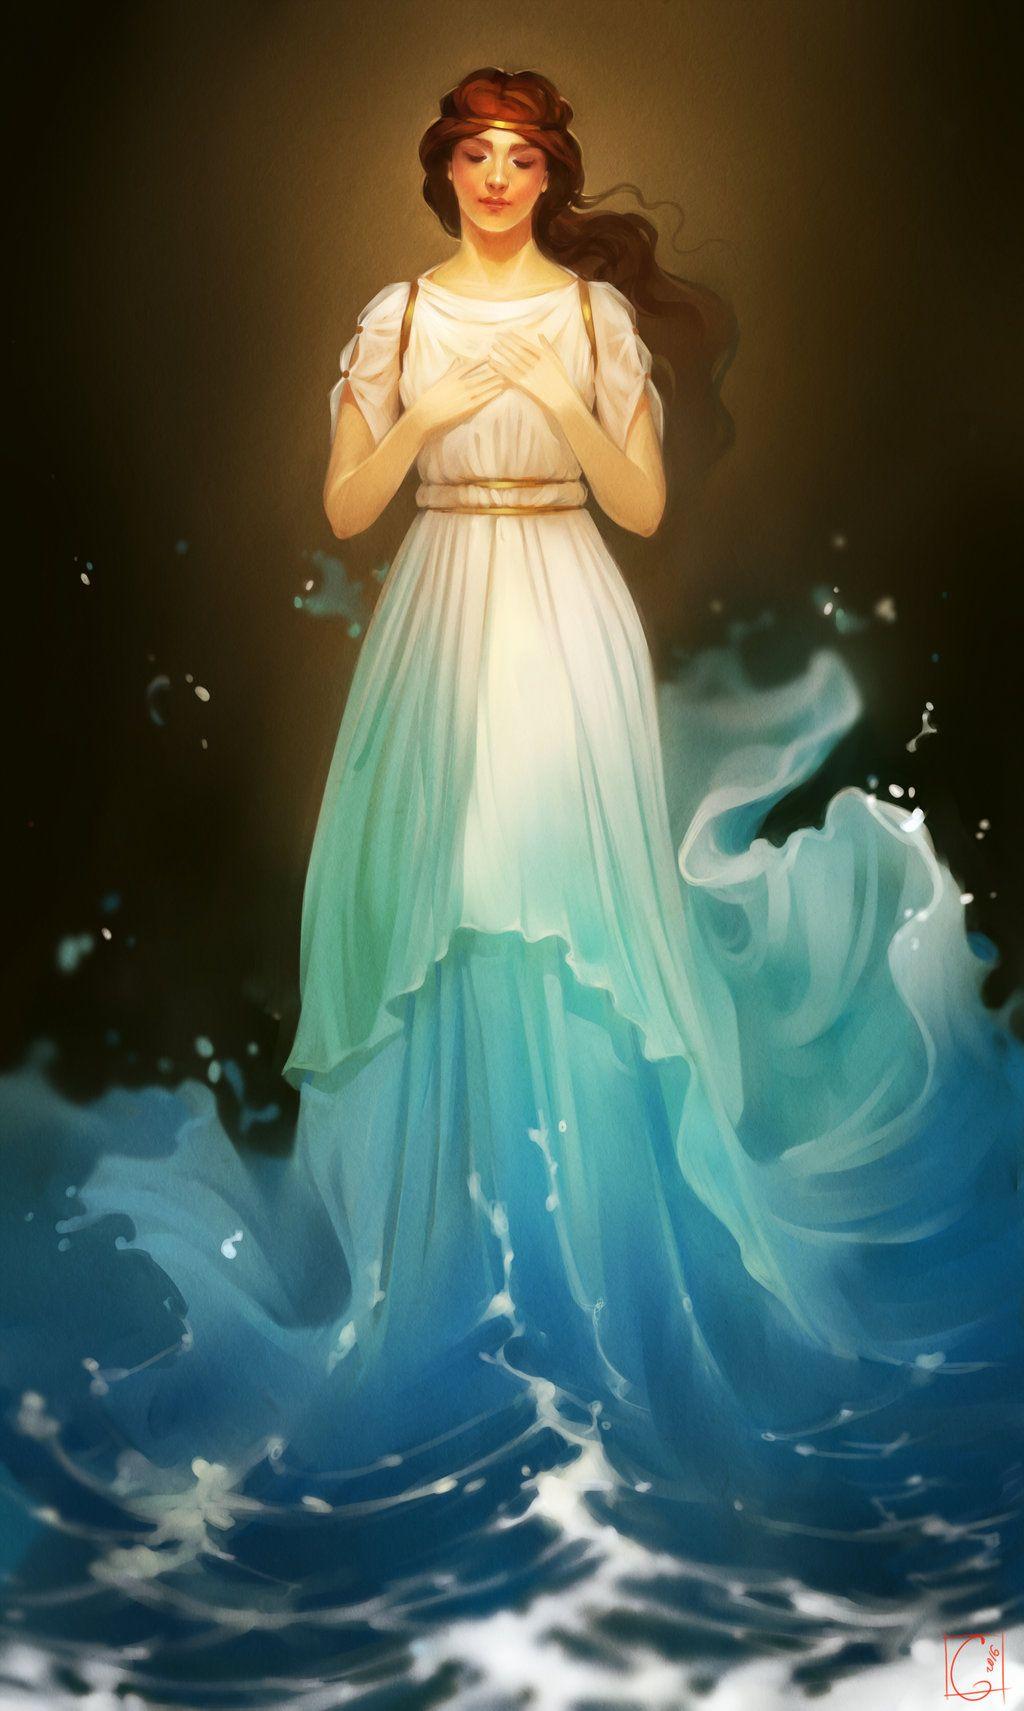 картинка богиня любви и красоты фото картинки широком ассортименте